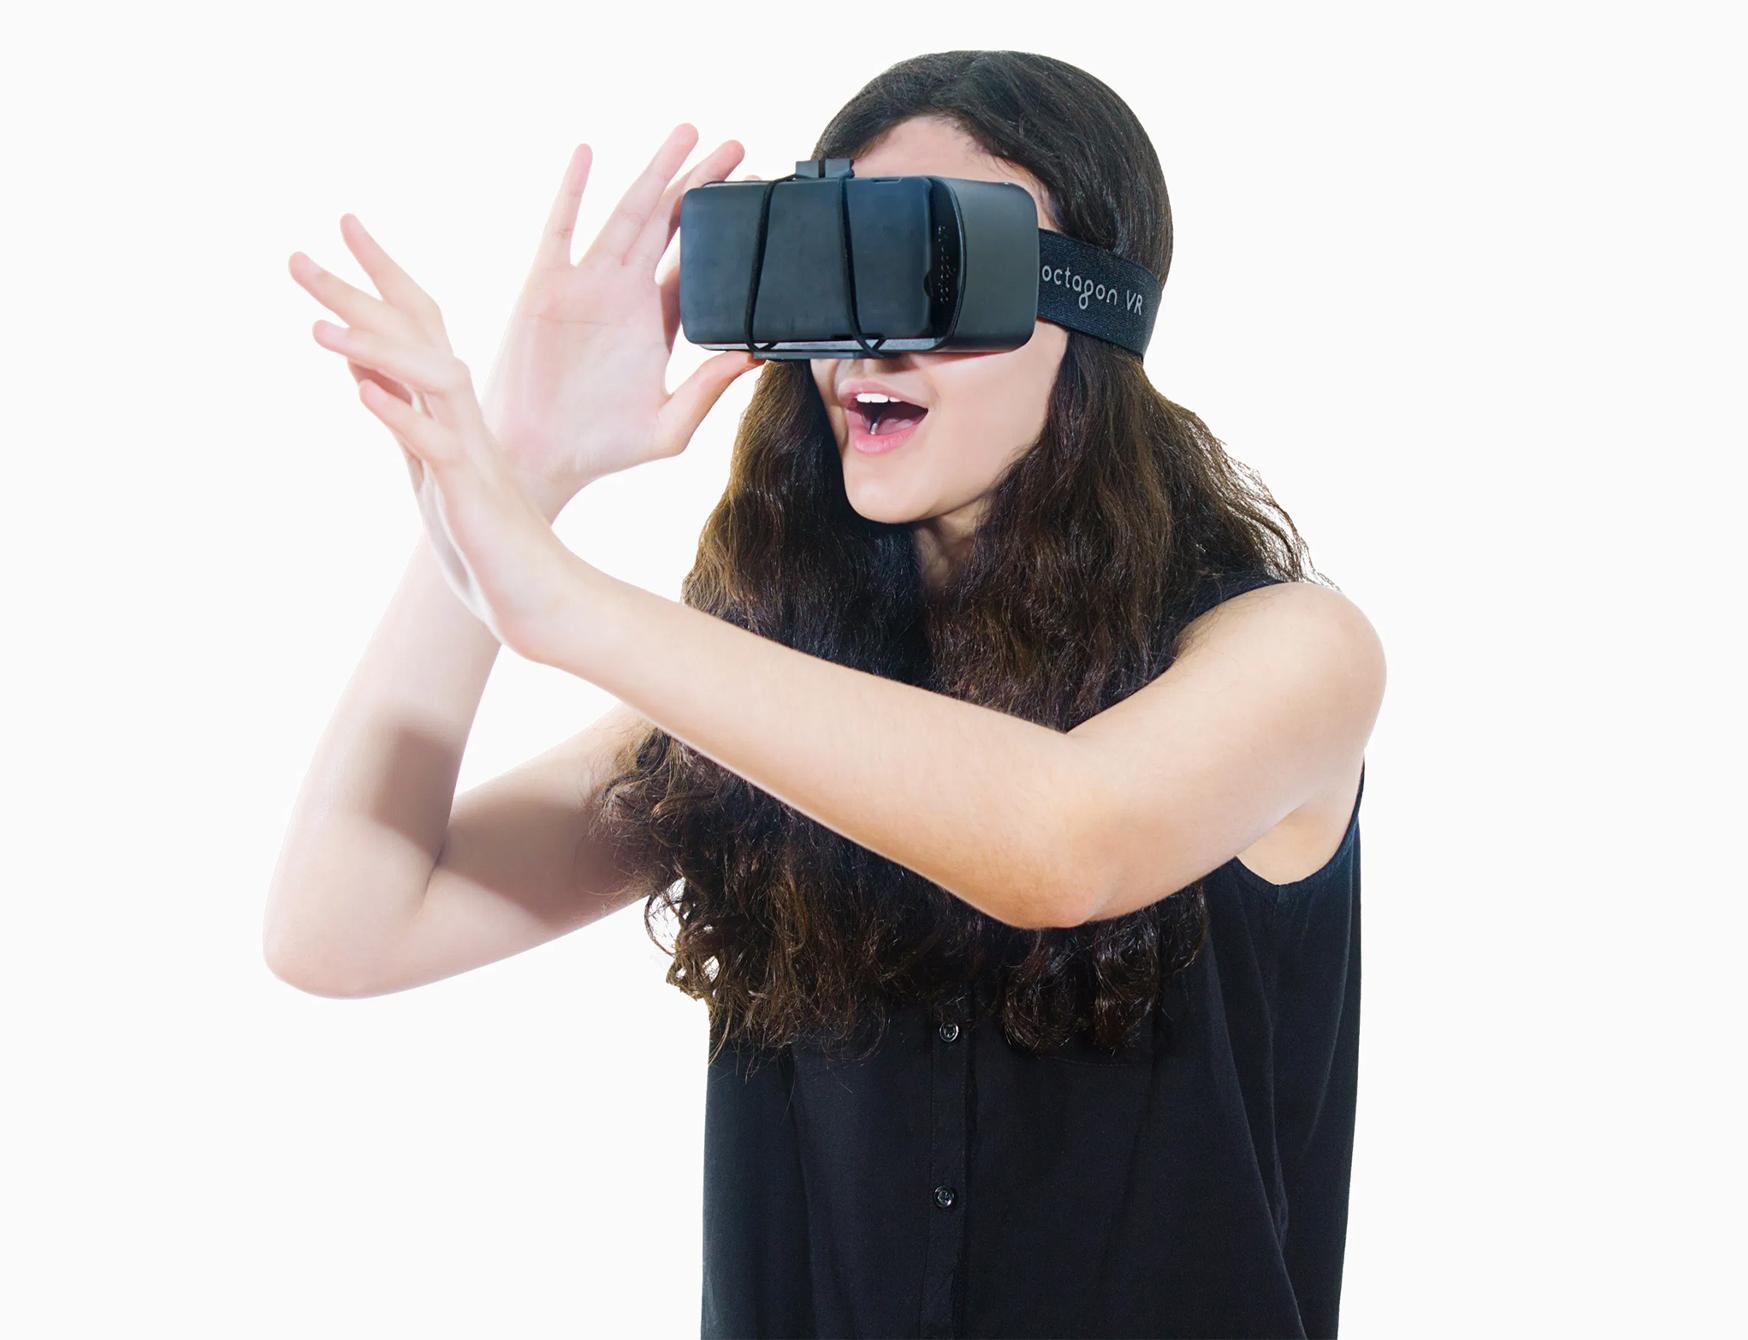 VR Headset – Immersive Multimedia in Entertainment